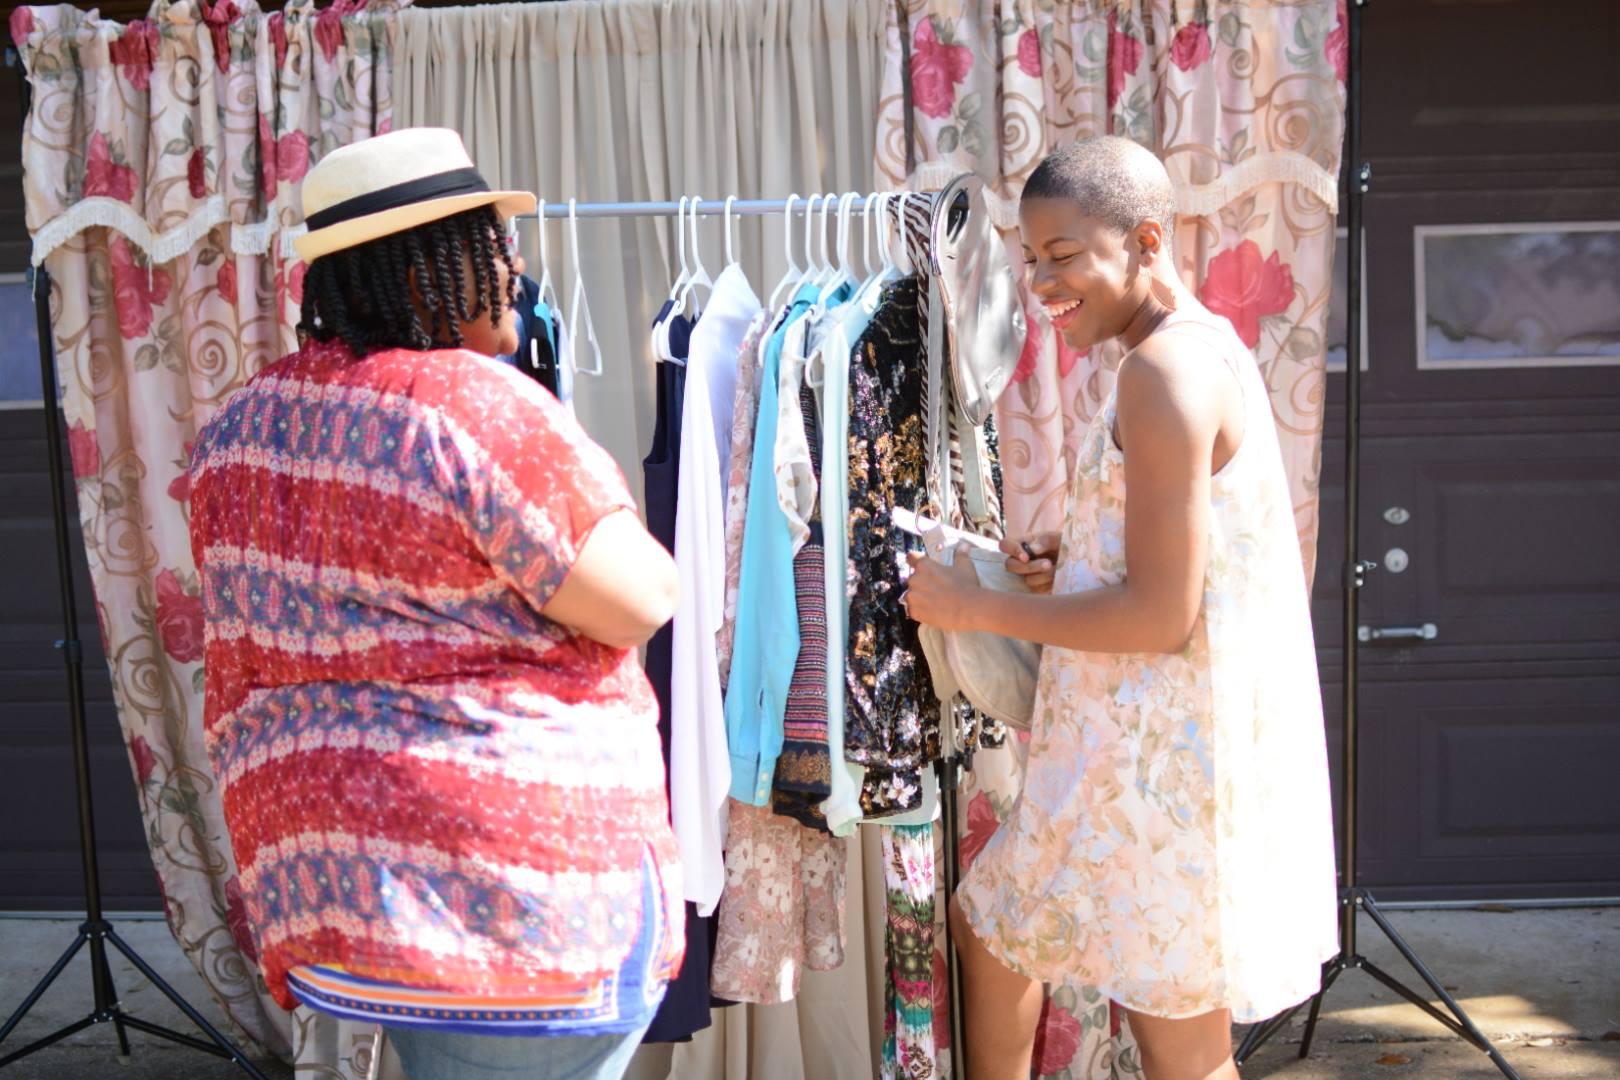 Old World New - clothing swap